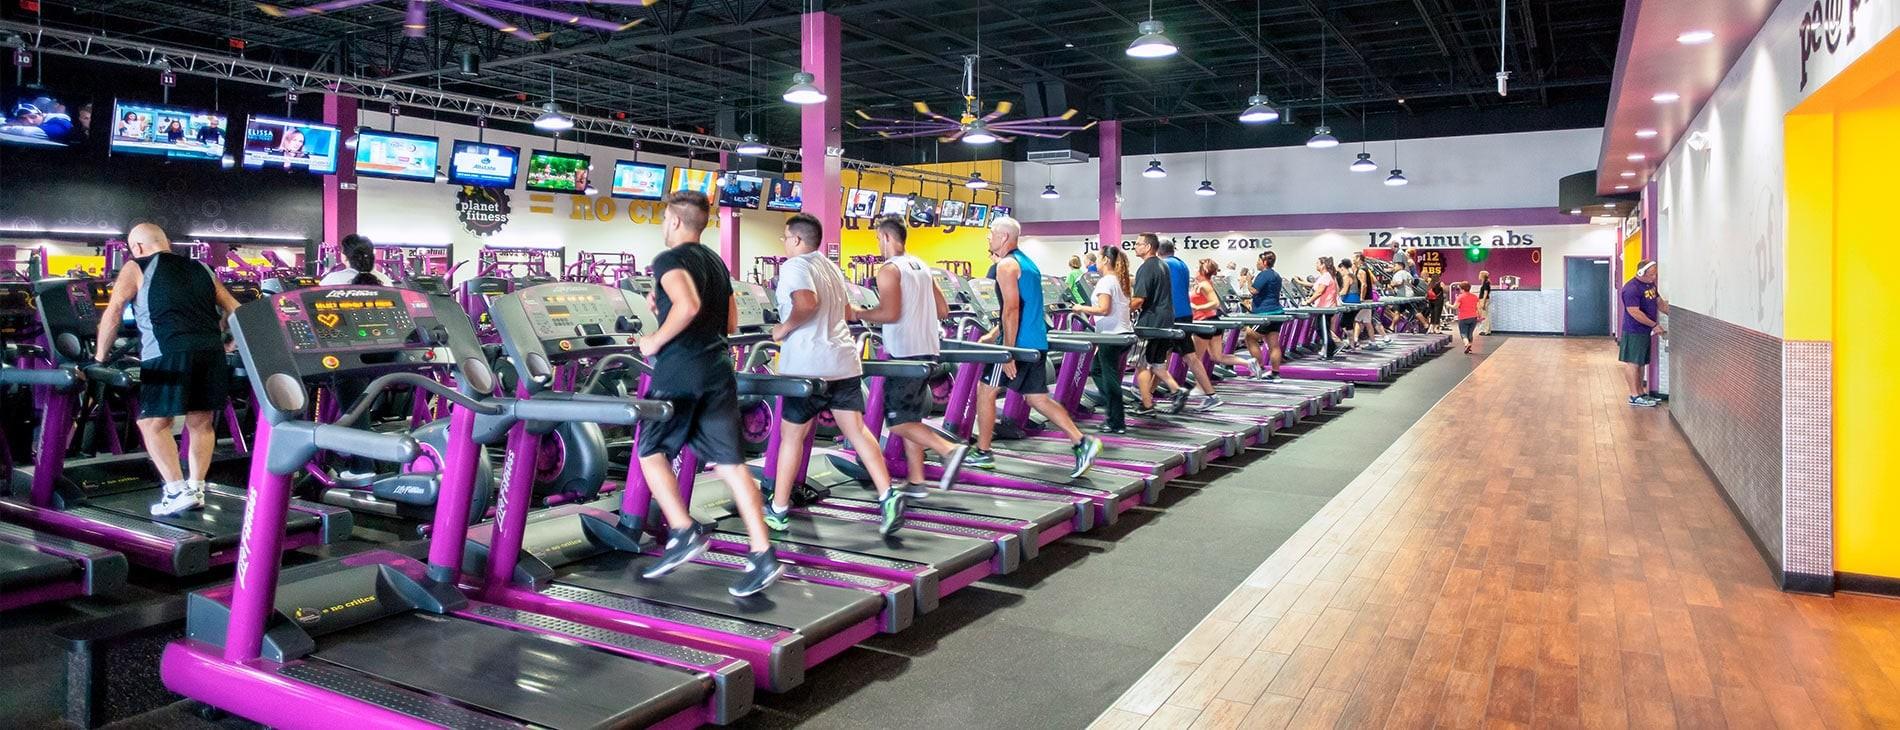 Planet Fitness Washington State Linkedin